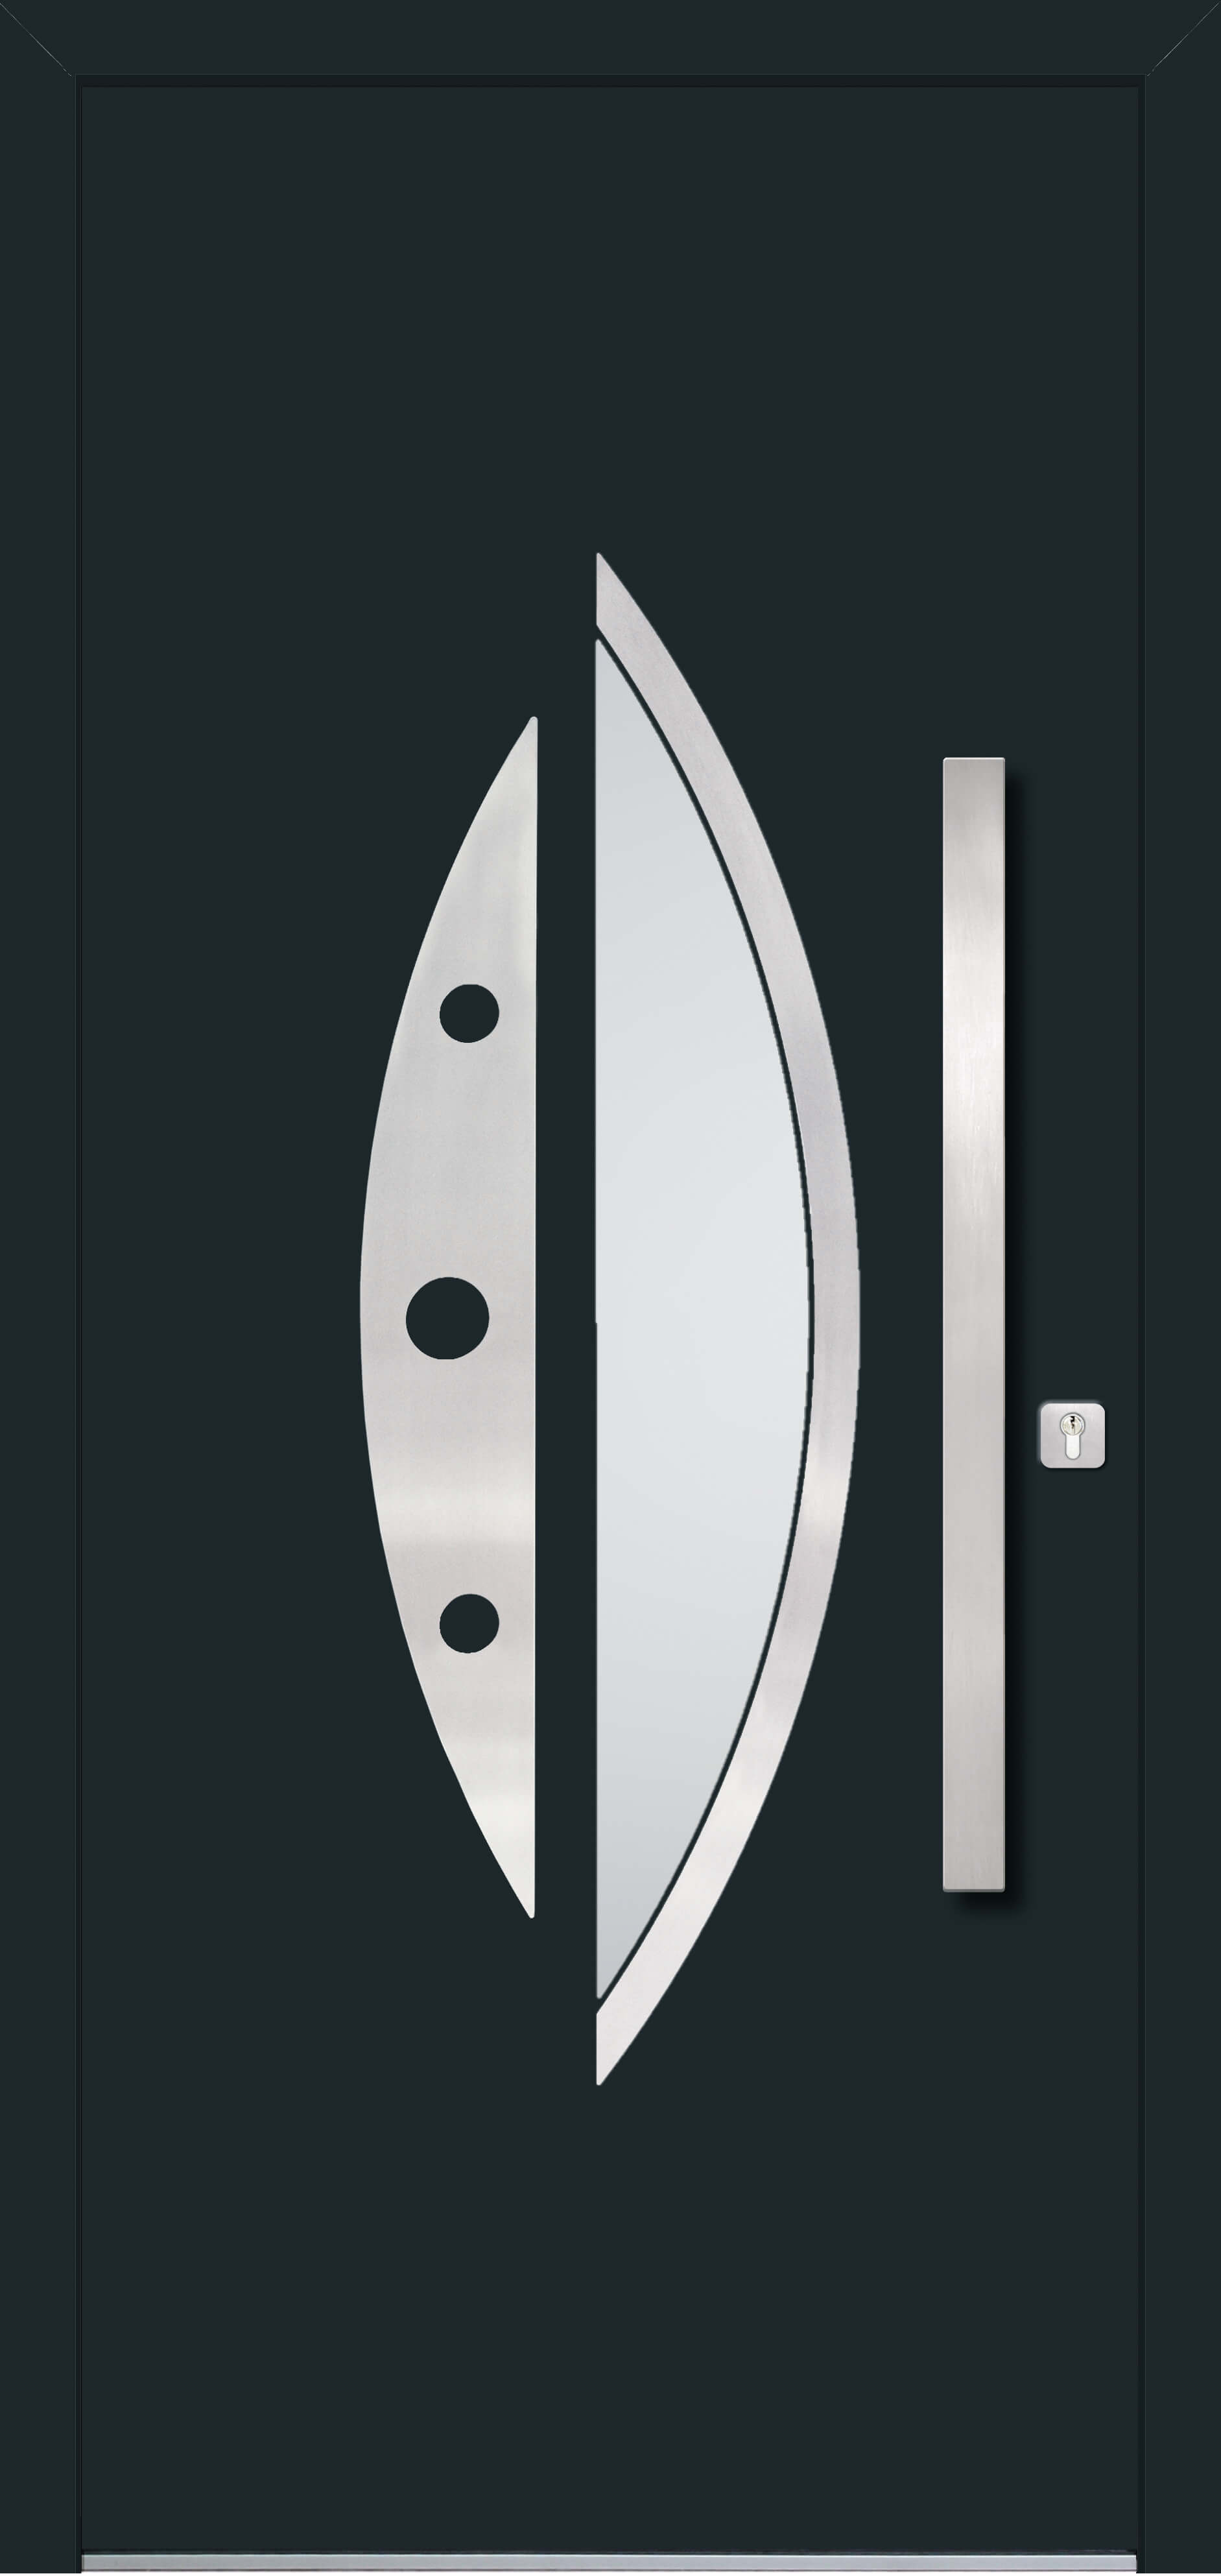 t ren darmex amsterdam montage oberhausen essen duisburg d sseldorf. Black Bedroom Furniture Sets. Home Design Ideas